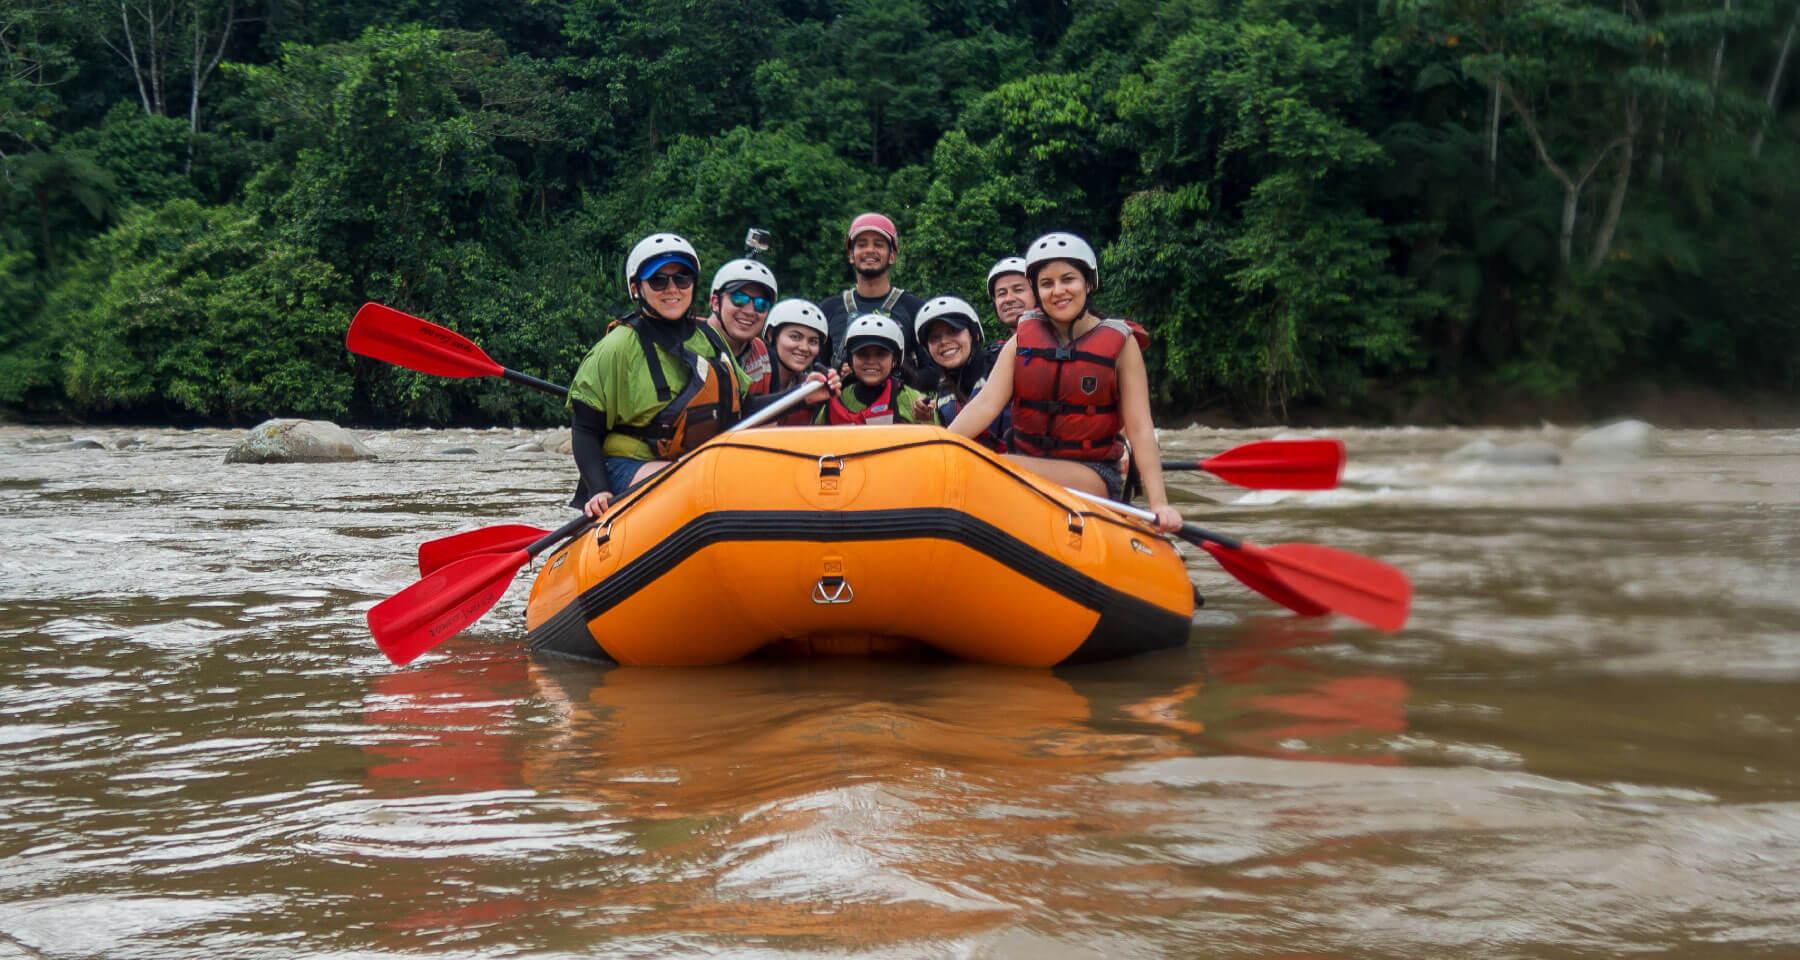 Friends and family in a rafting boat in Anzu river in Southamerica, Ecuador